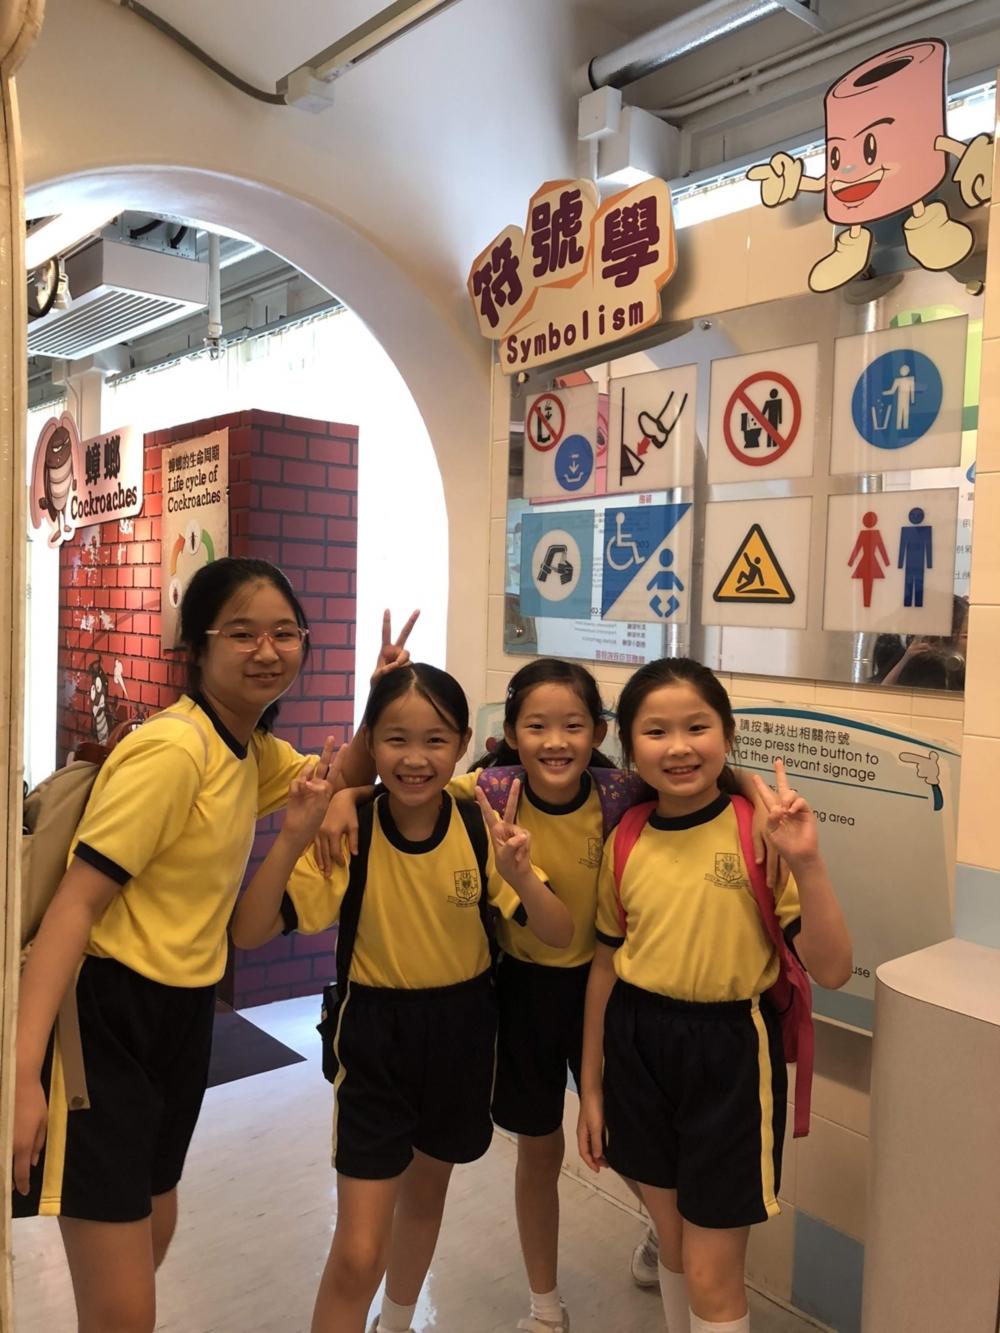 http://pohckwps.edu.hk/sites/default/files/34_9.jpg